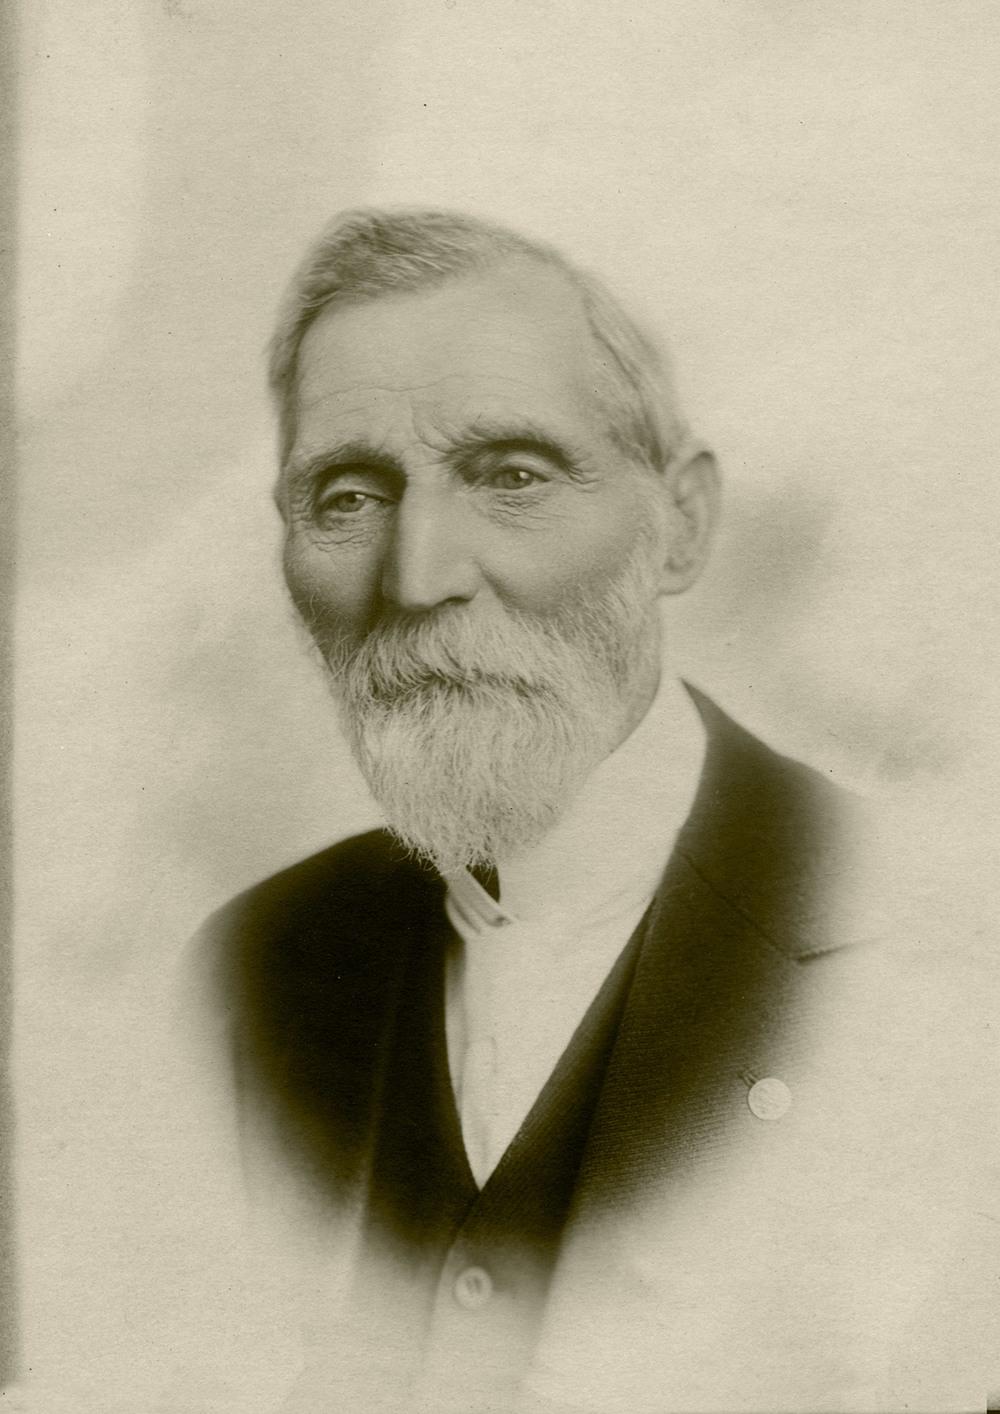 James Paull Walker